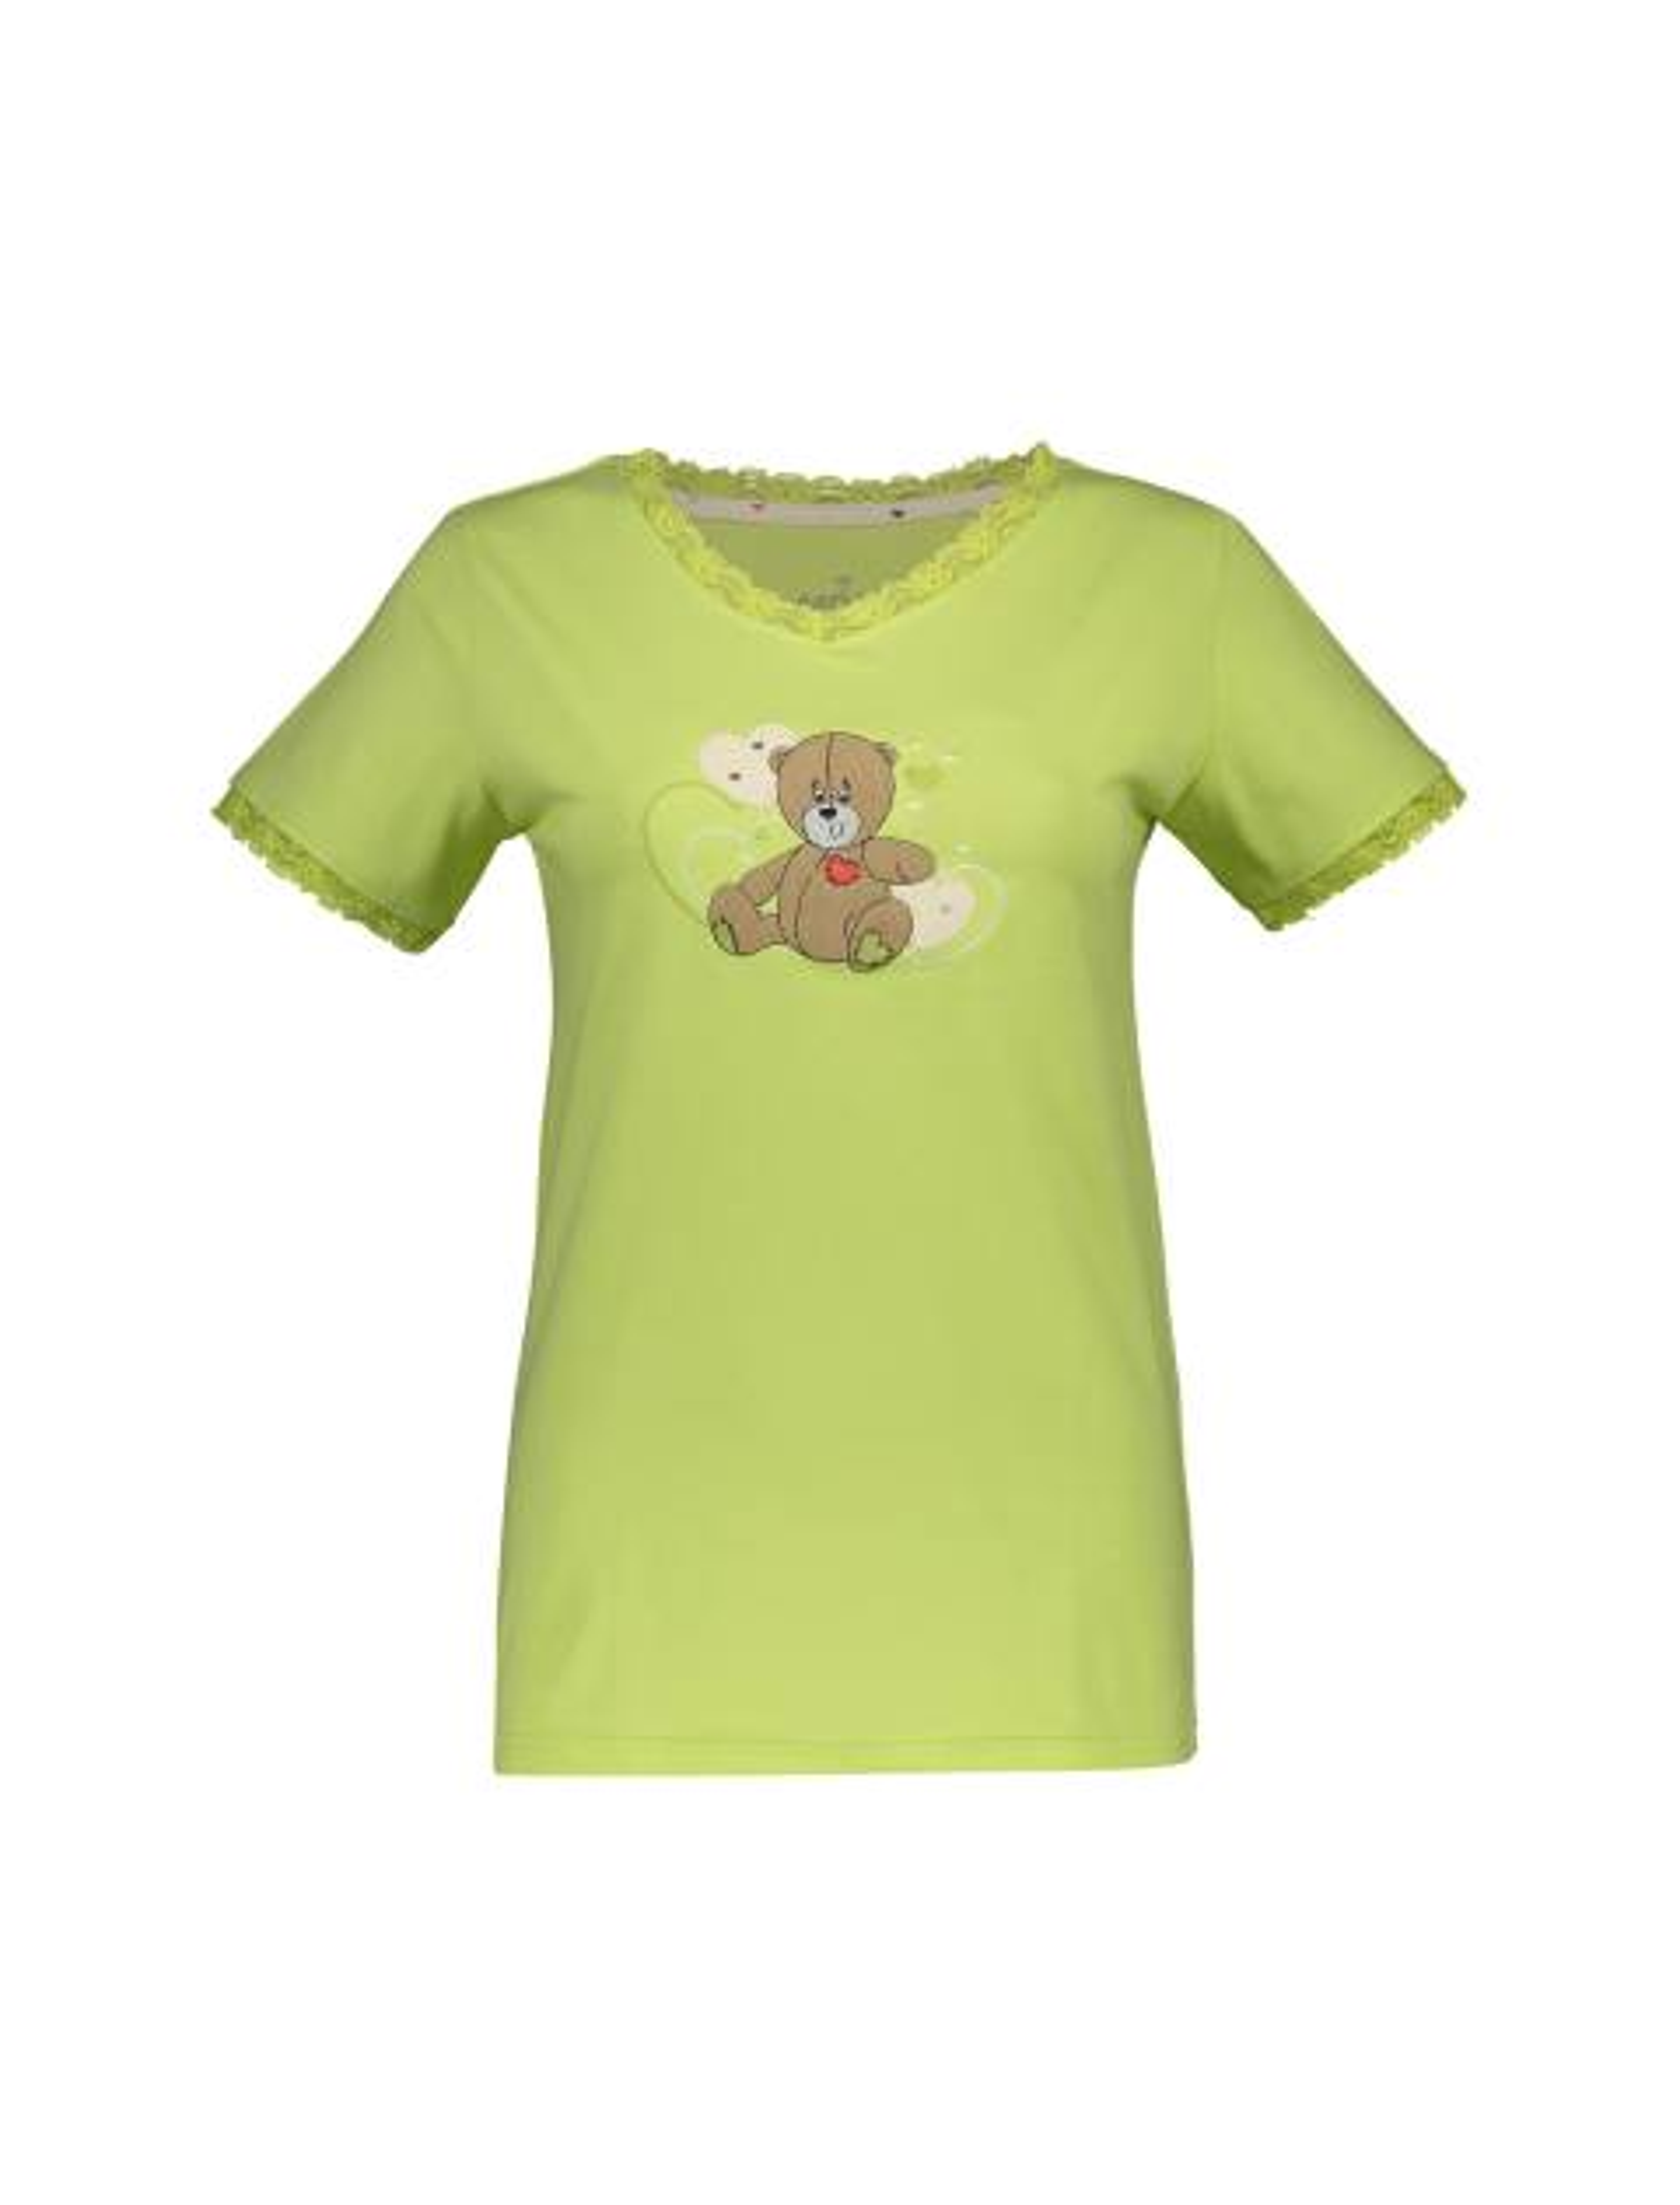 تی شرت و شلوار نخی زنانه خرس مهربان - سبز - 1